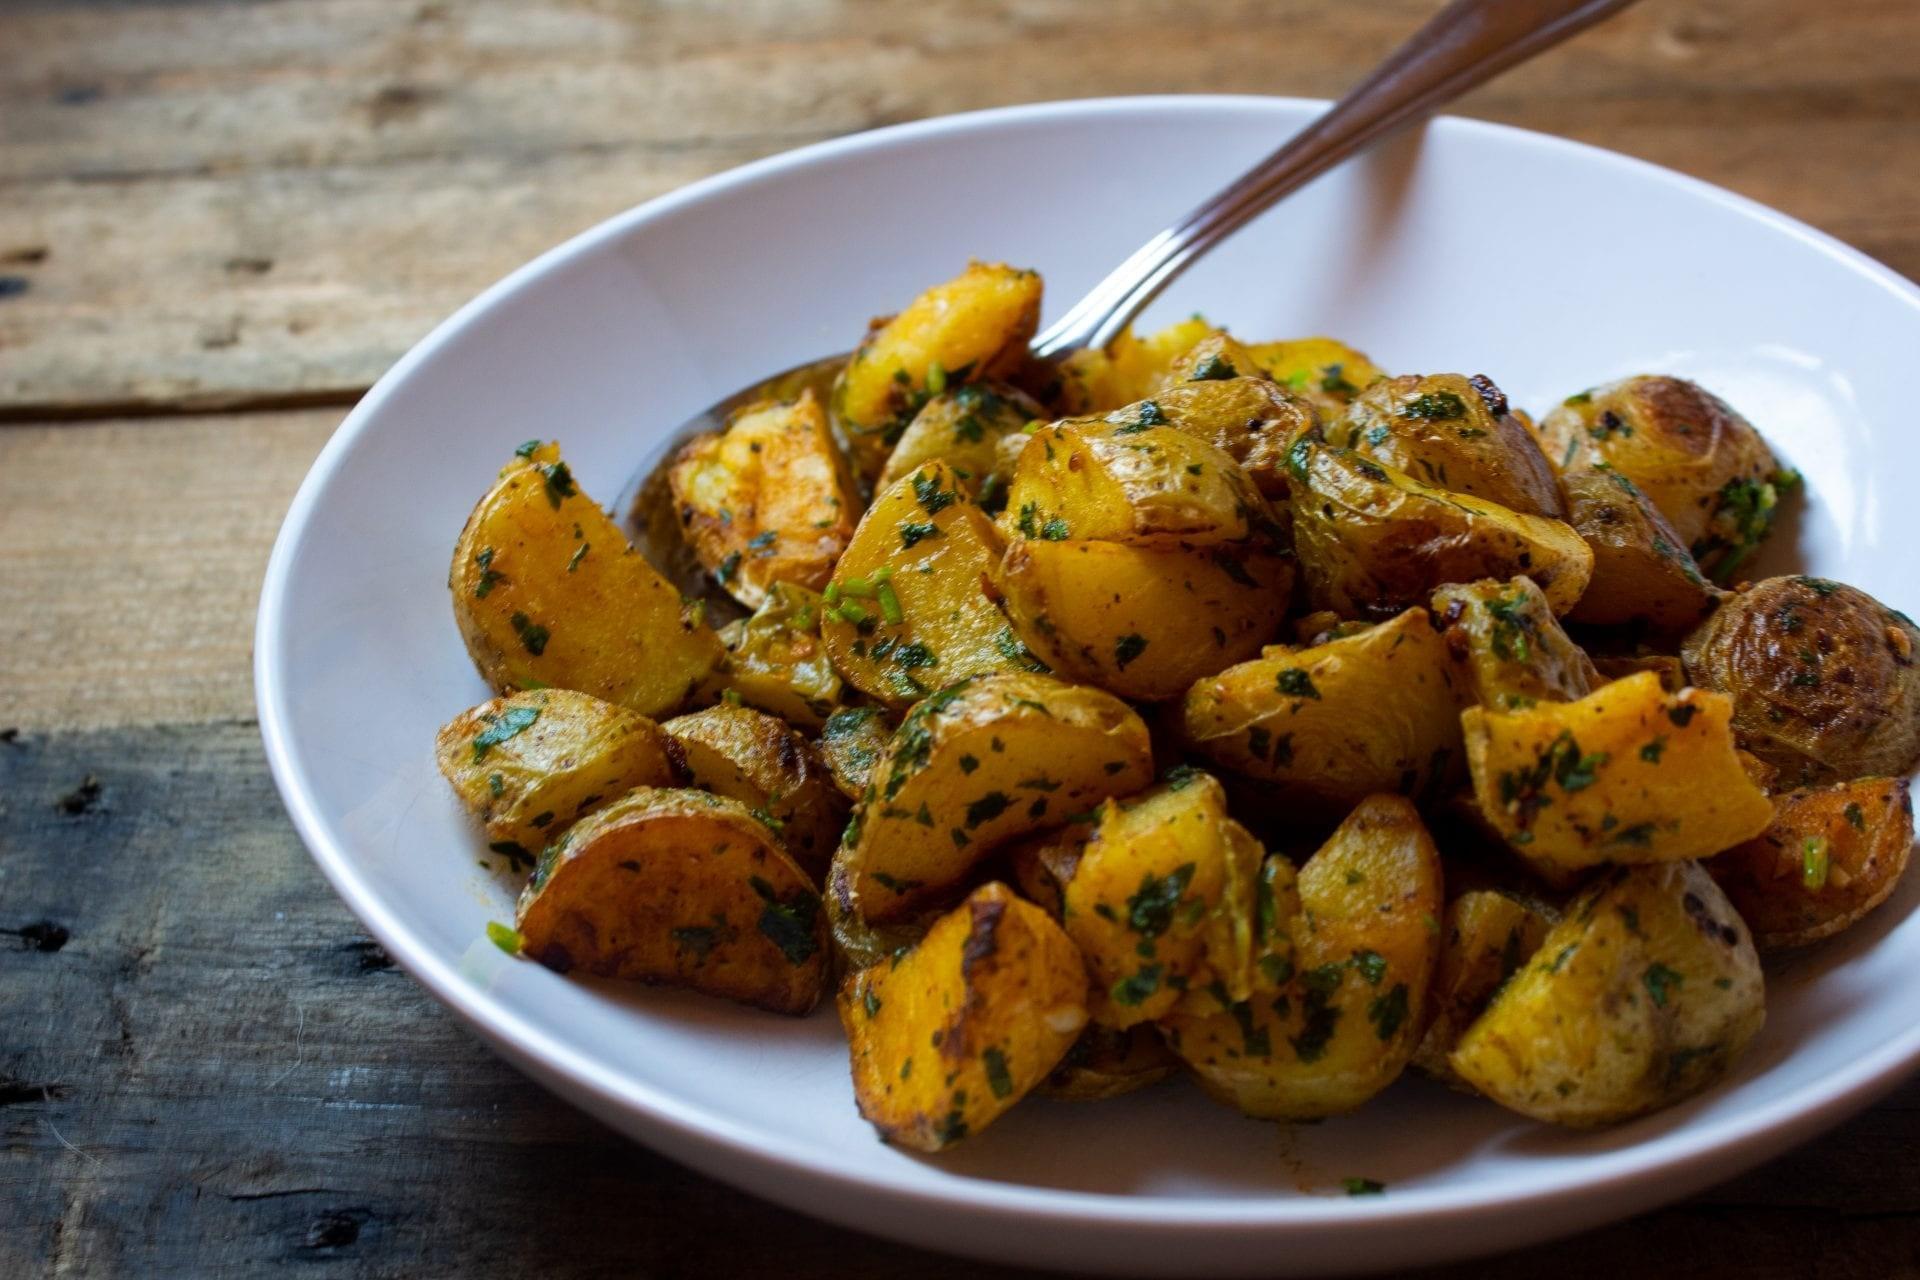 Roasted Potatoes with Garlic, Lemon, and Cilantro (Batata Hara)